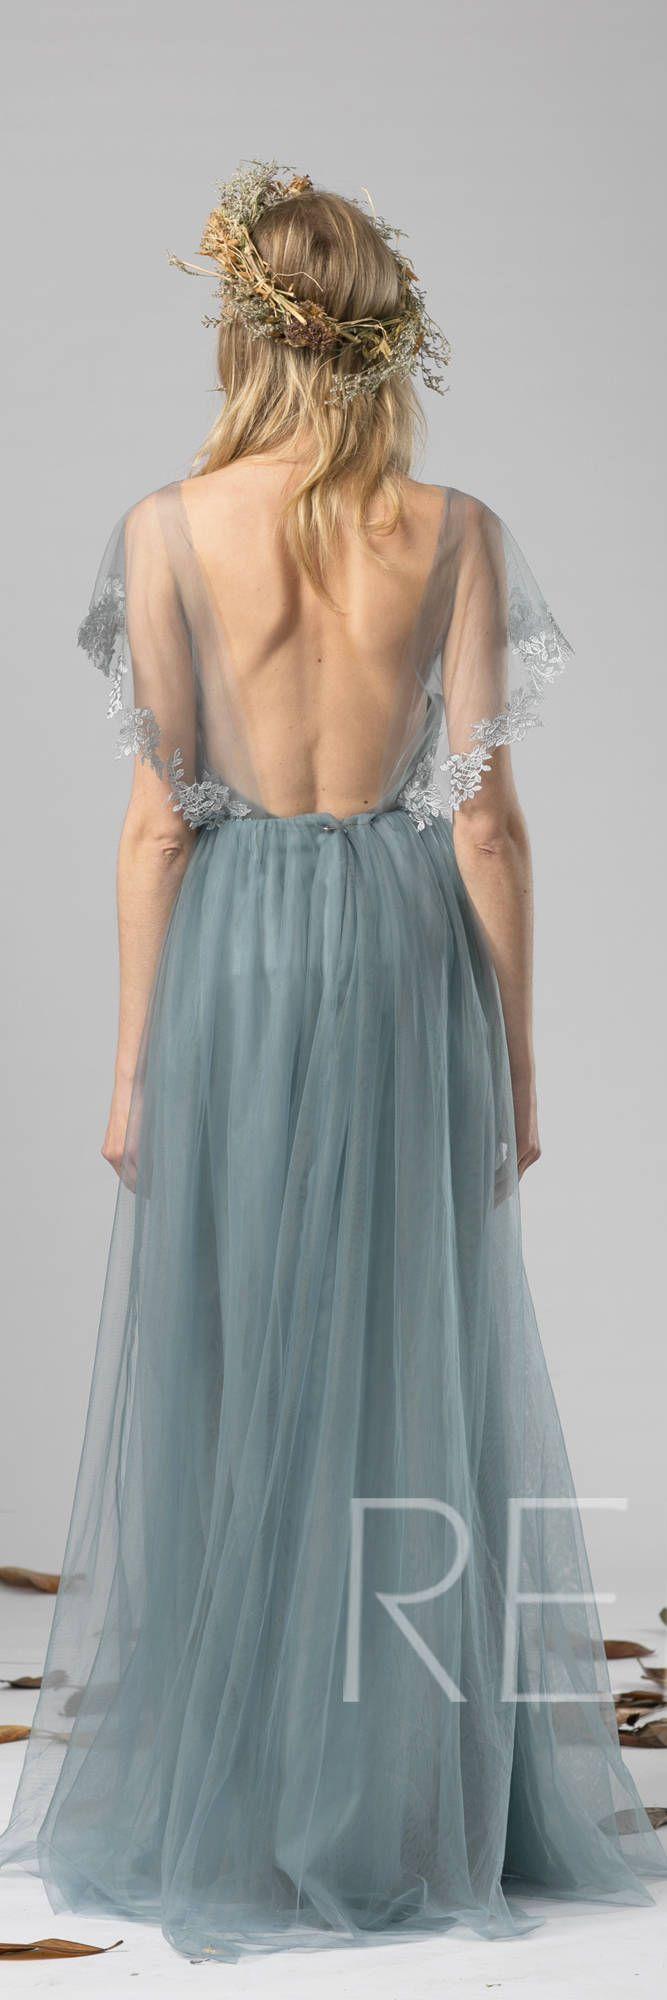 Bridesmaid dress dusty blue tulle dress wedding dresslace ruffle